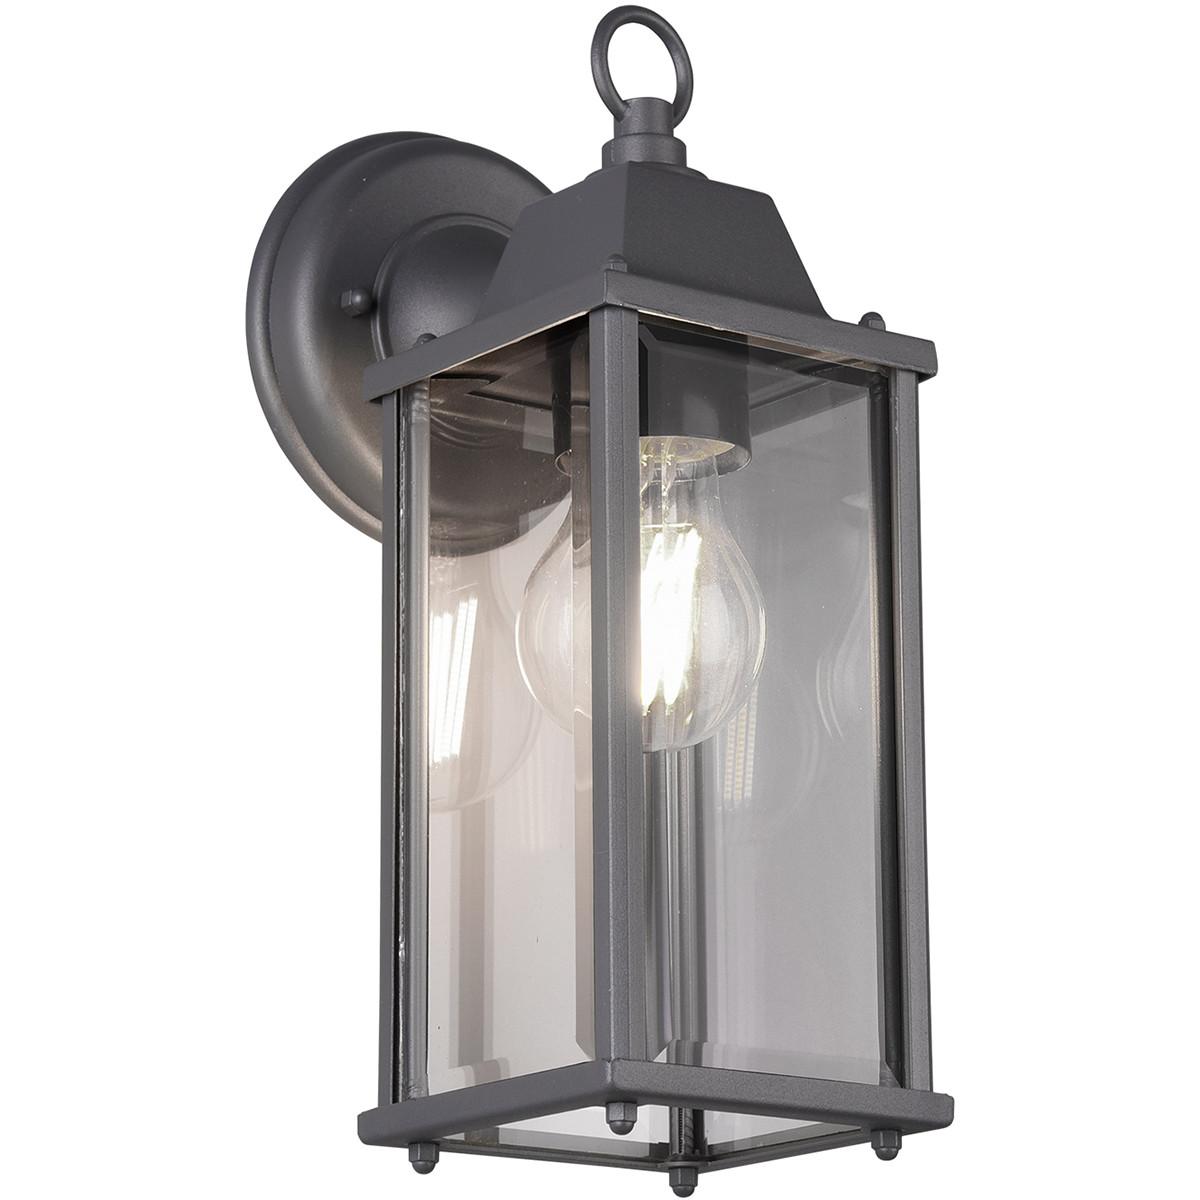 LED Tuinverlichting - Tuinlamp - Trion Olenany - Wand - E27 Fitting - Mat Zwart - Aluminium